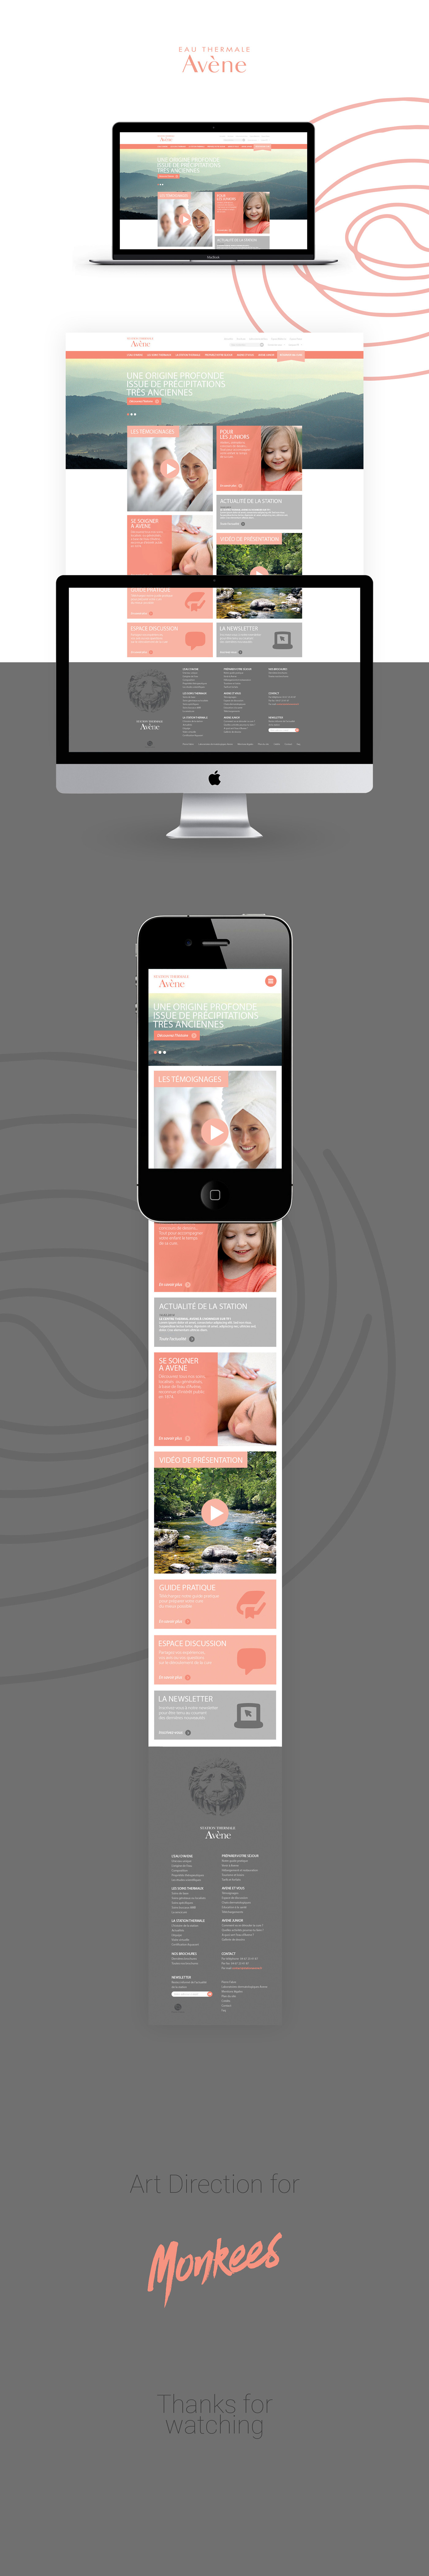 ArtDirection avene design directionartistique graphic HTML pierrefabre Web Webdesign